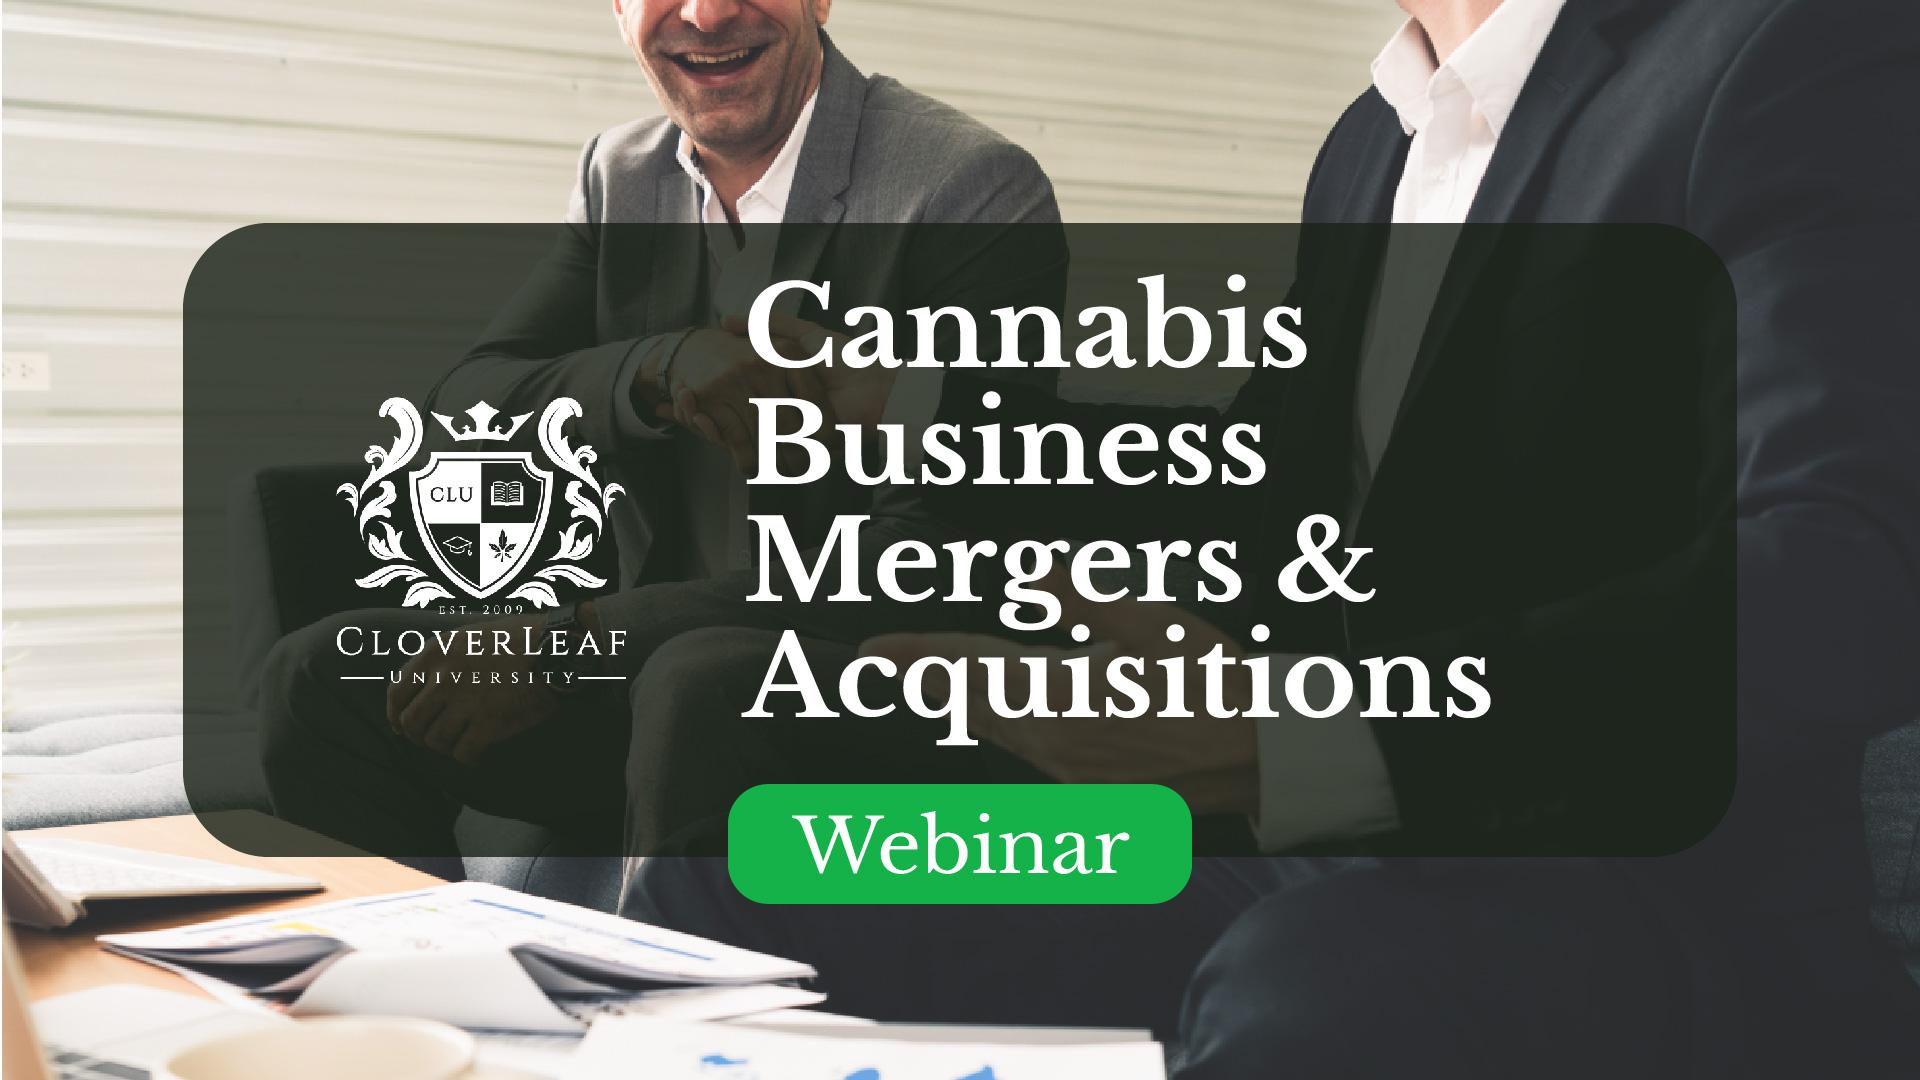 Cannabis Business Mergers & Acquisitions - Webinar